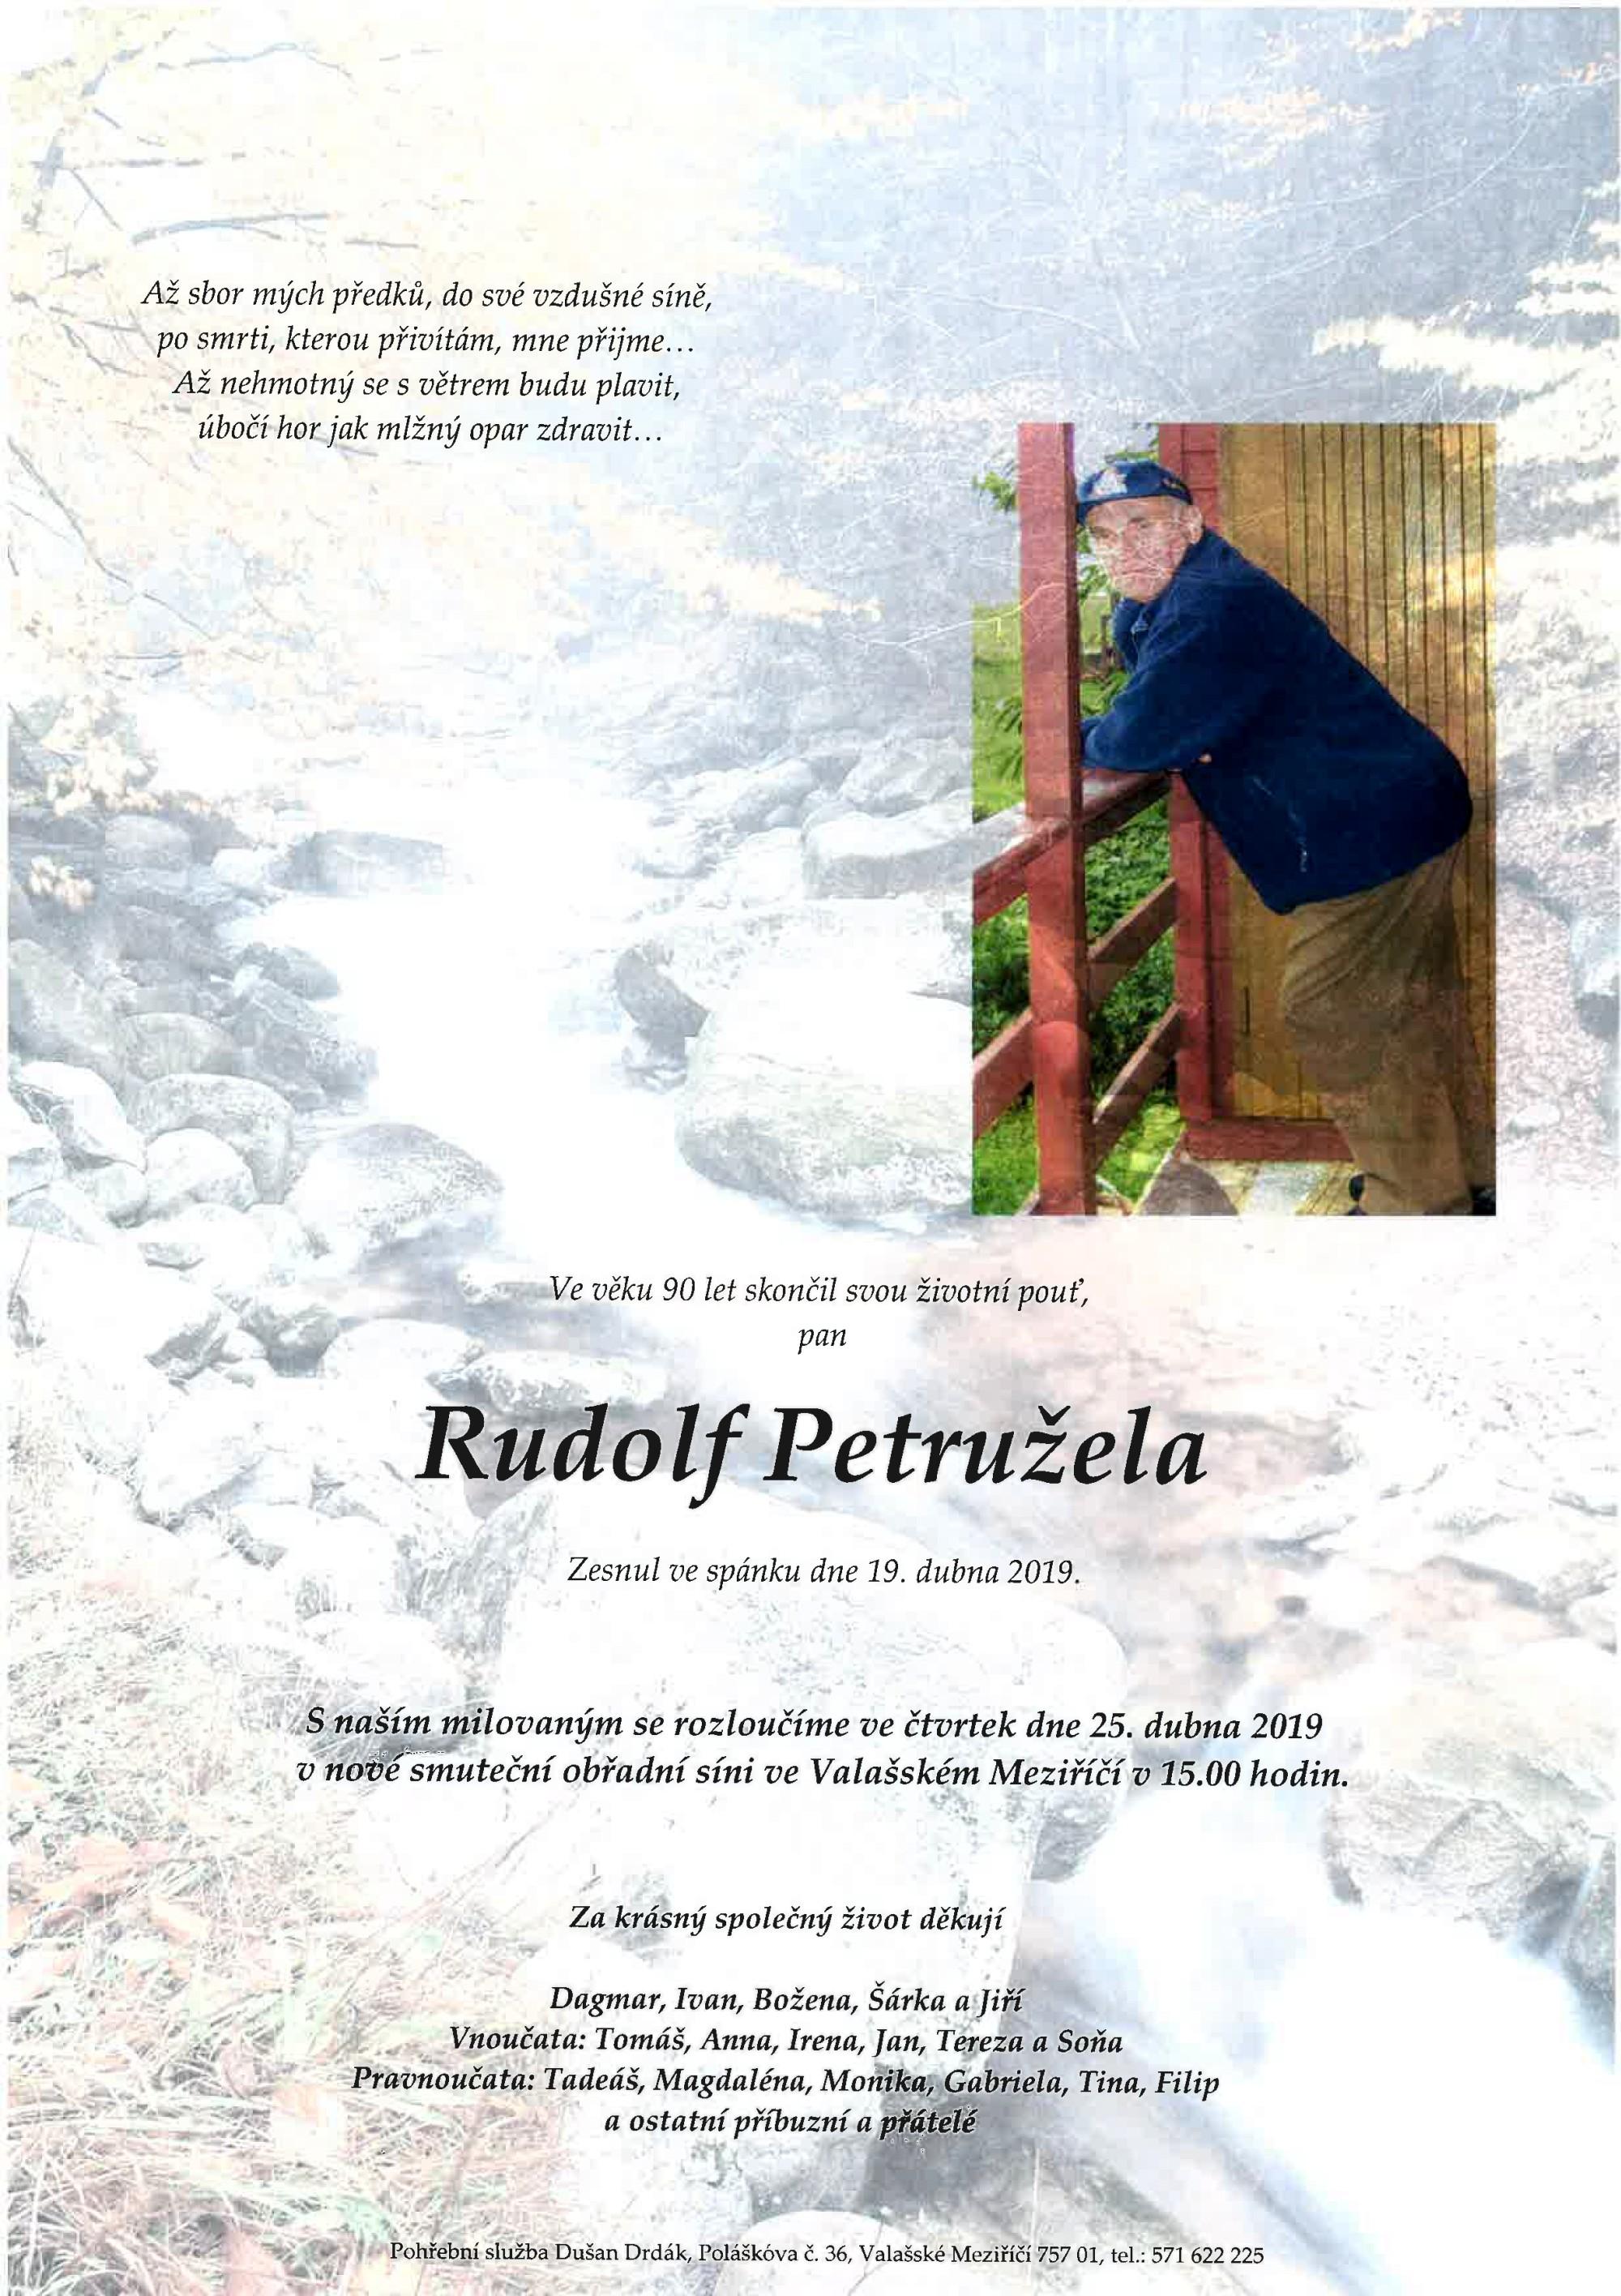 Rudolf Petružela